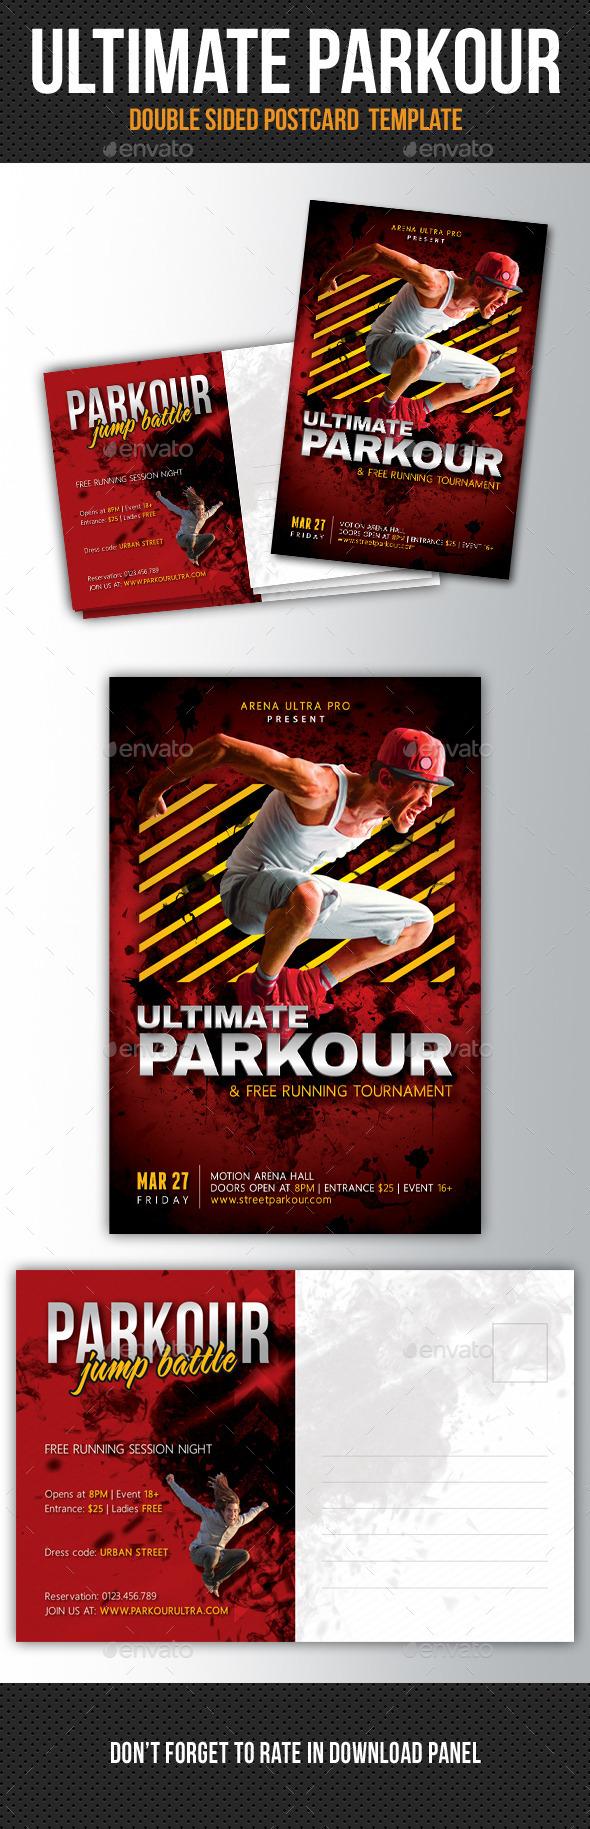 Ultimate Parkour Postcard V2 - Cards & Invites Print Templates